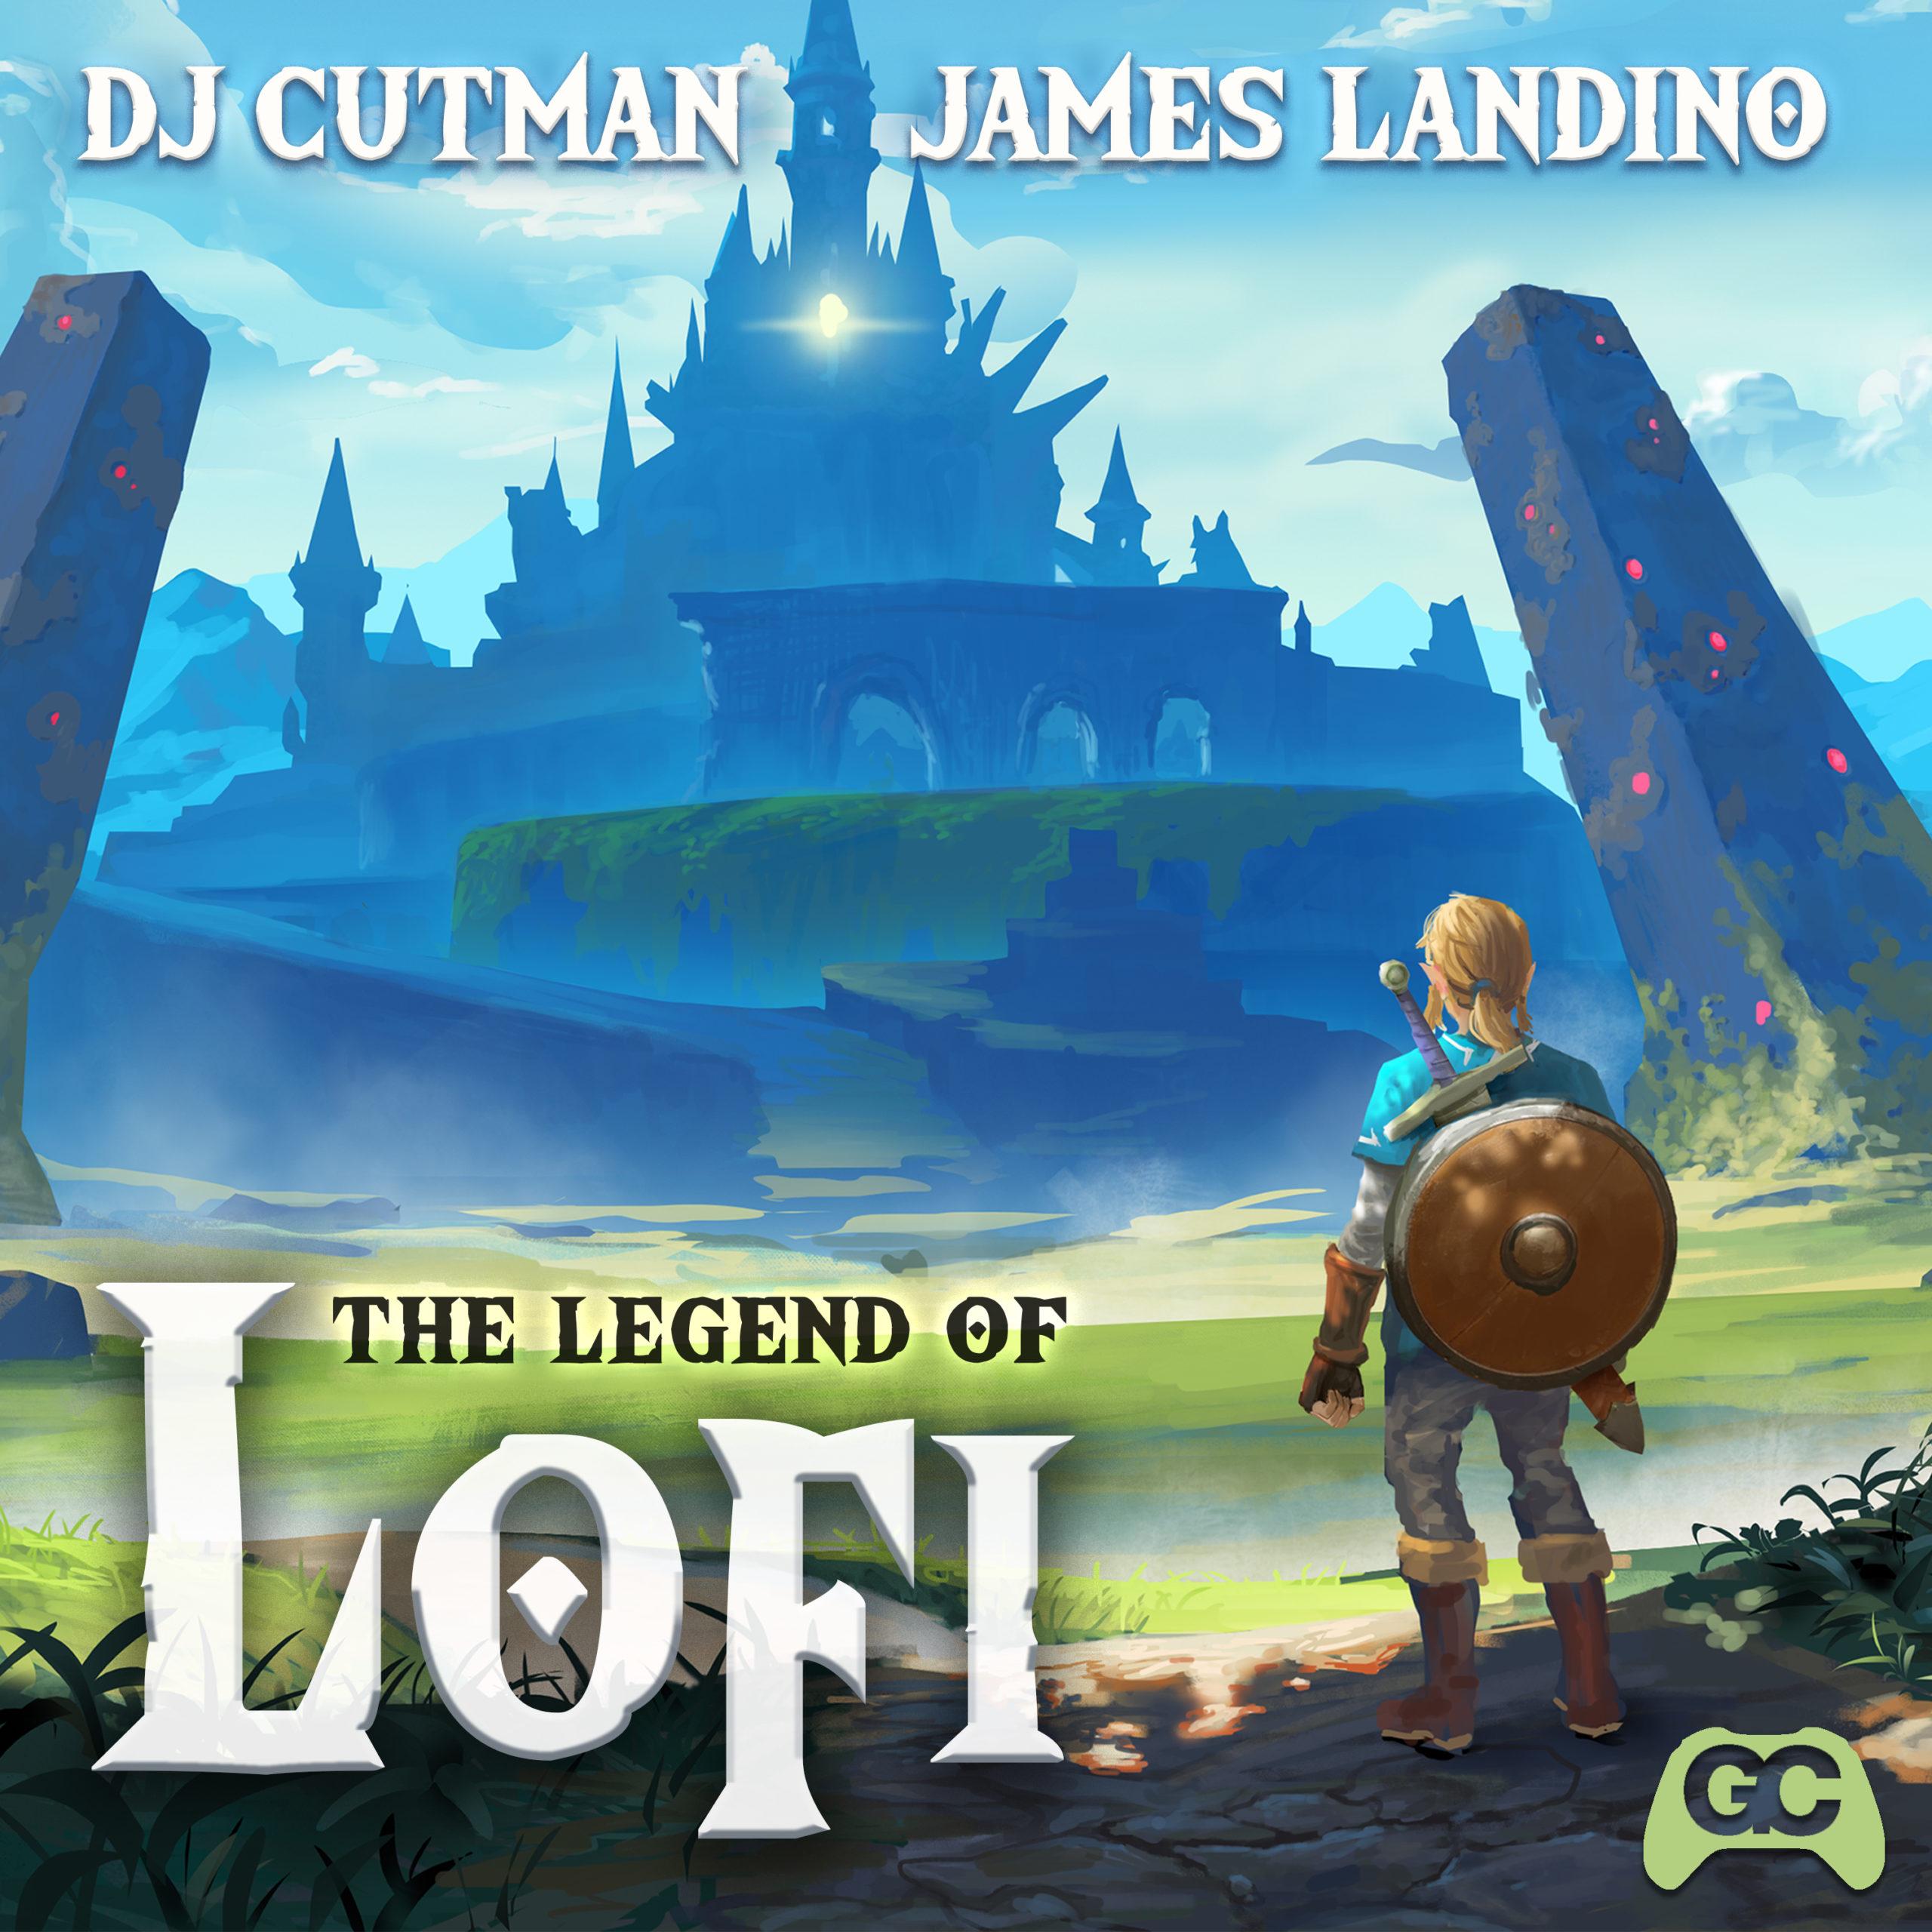 The Legend of LoFi – Dj Cutman & James Landino